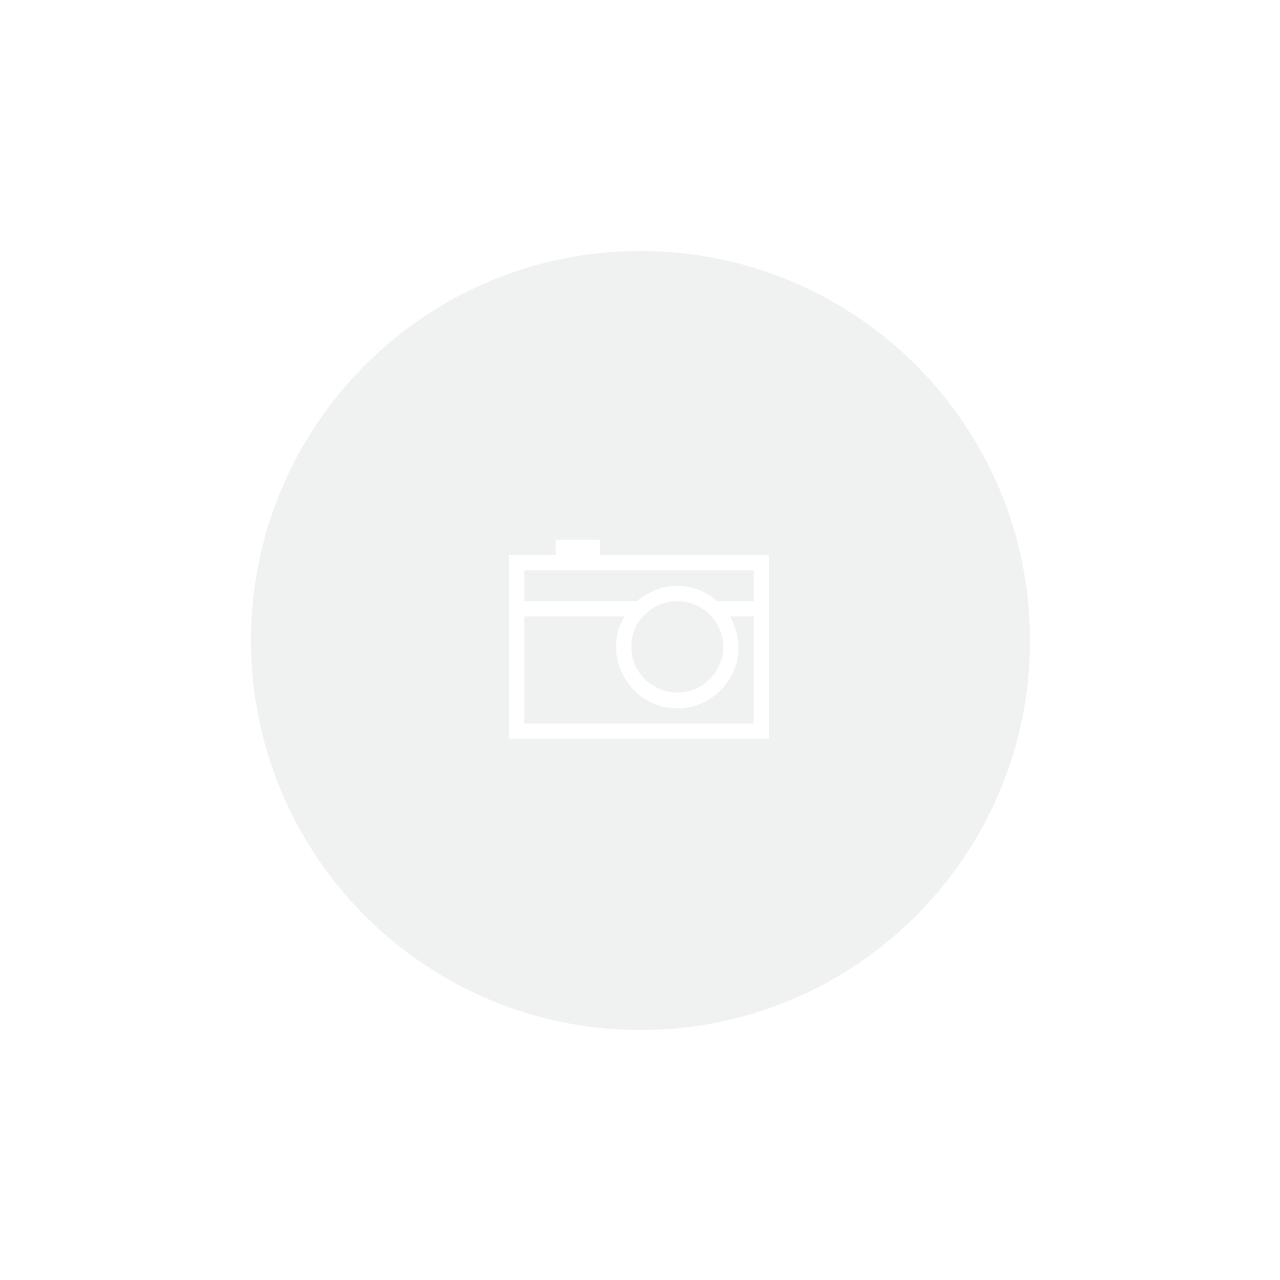 Panela Wok Inox 32cm 5,10 Litros Trix Tramontina